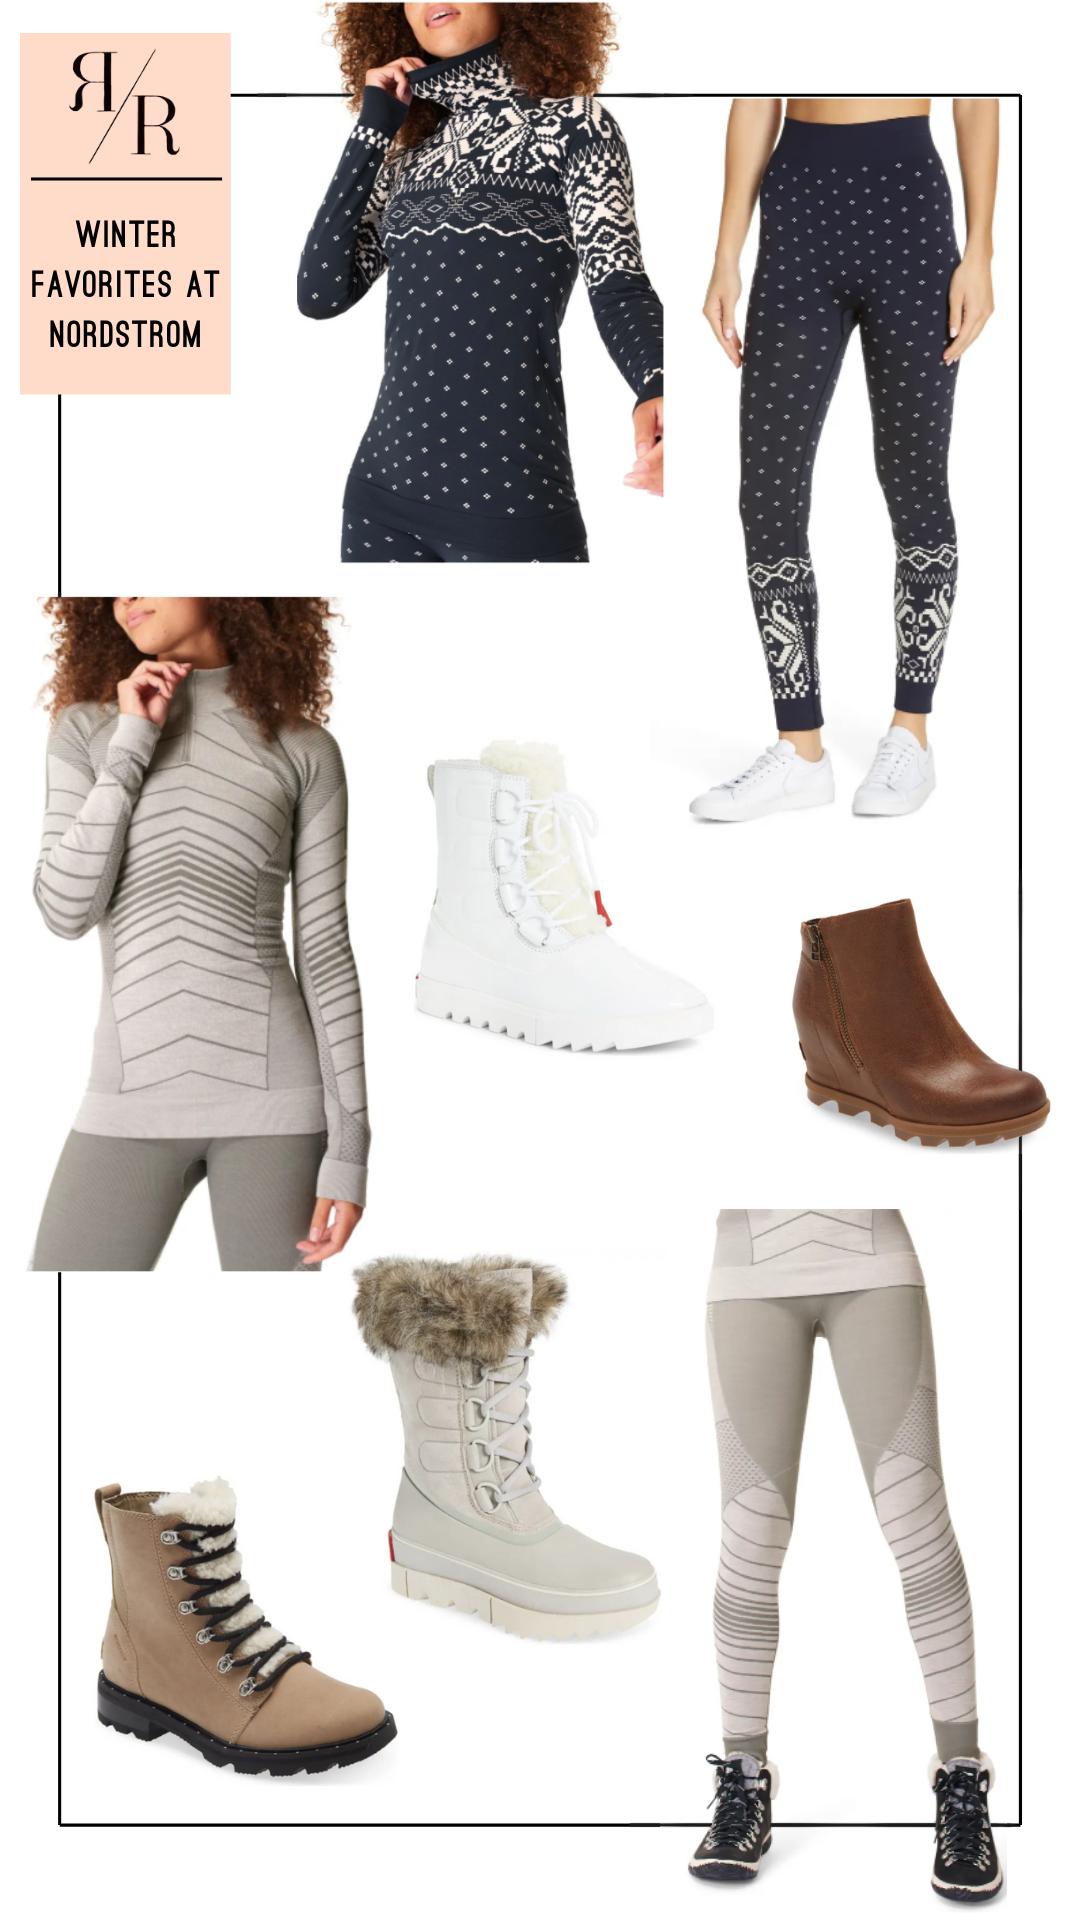 Ruthie Ridley Blog Winter Favorites At Nordstrom